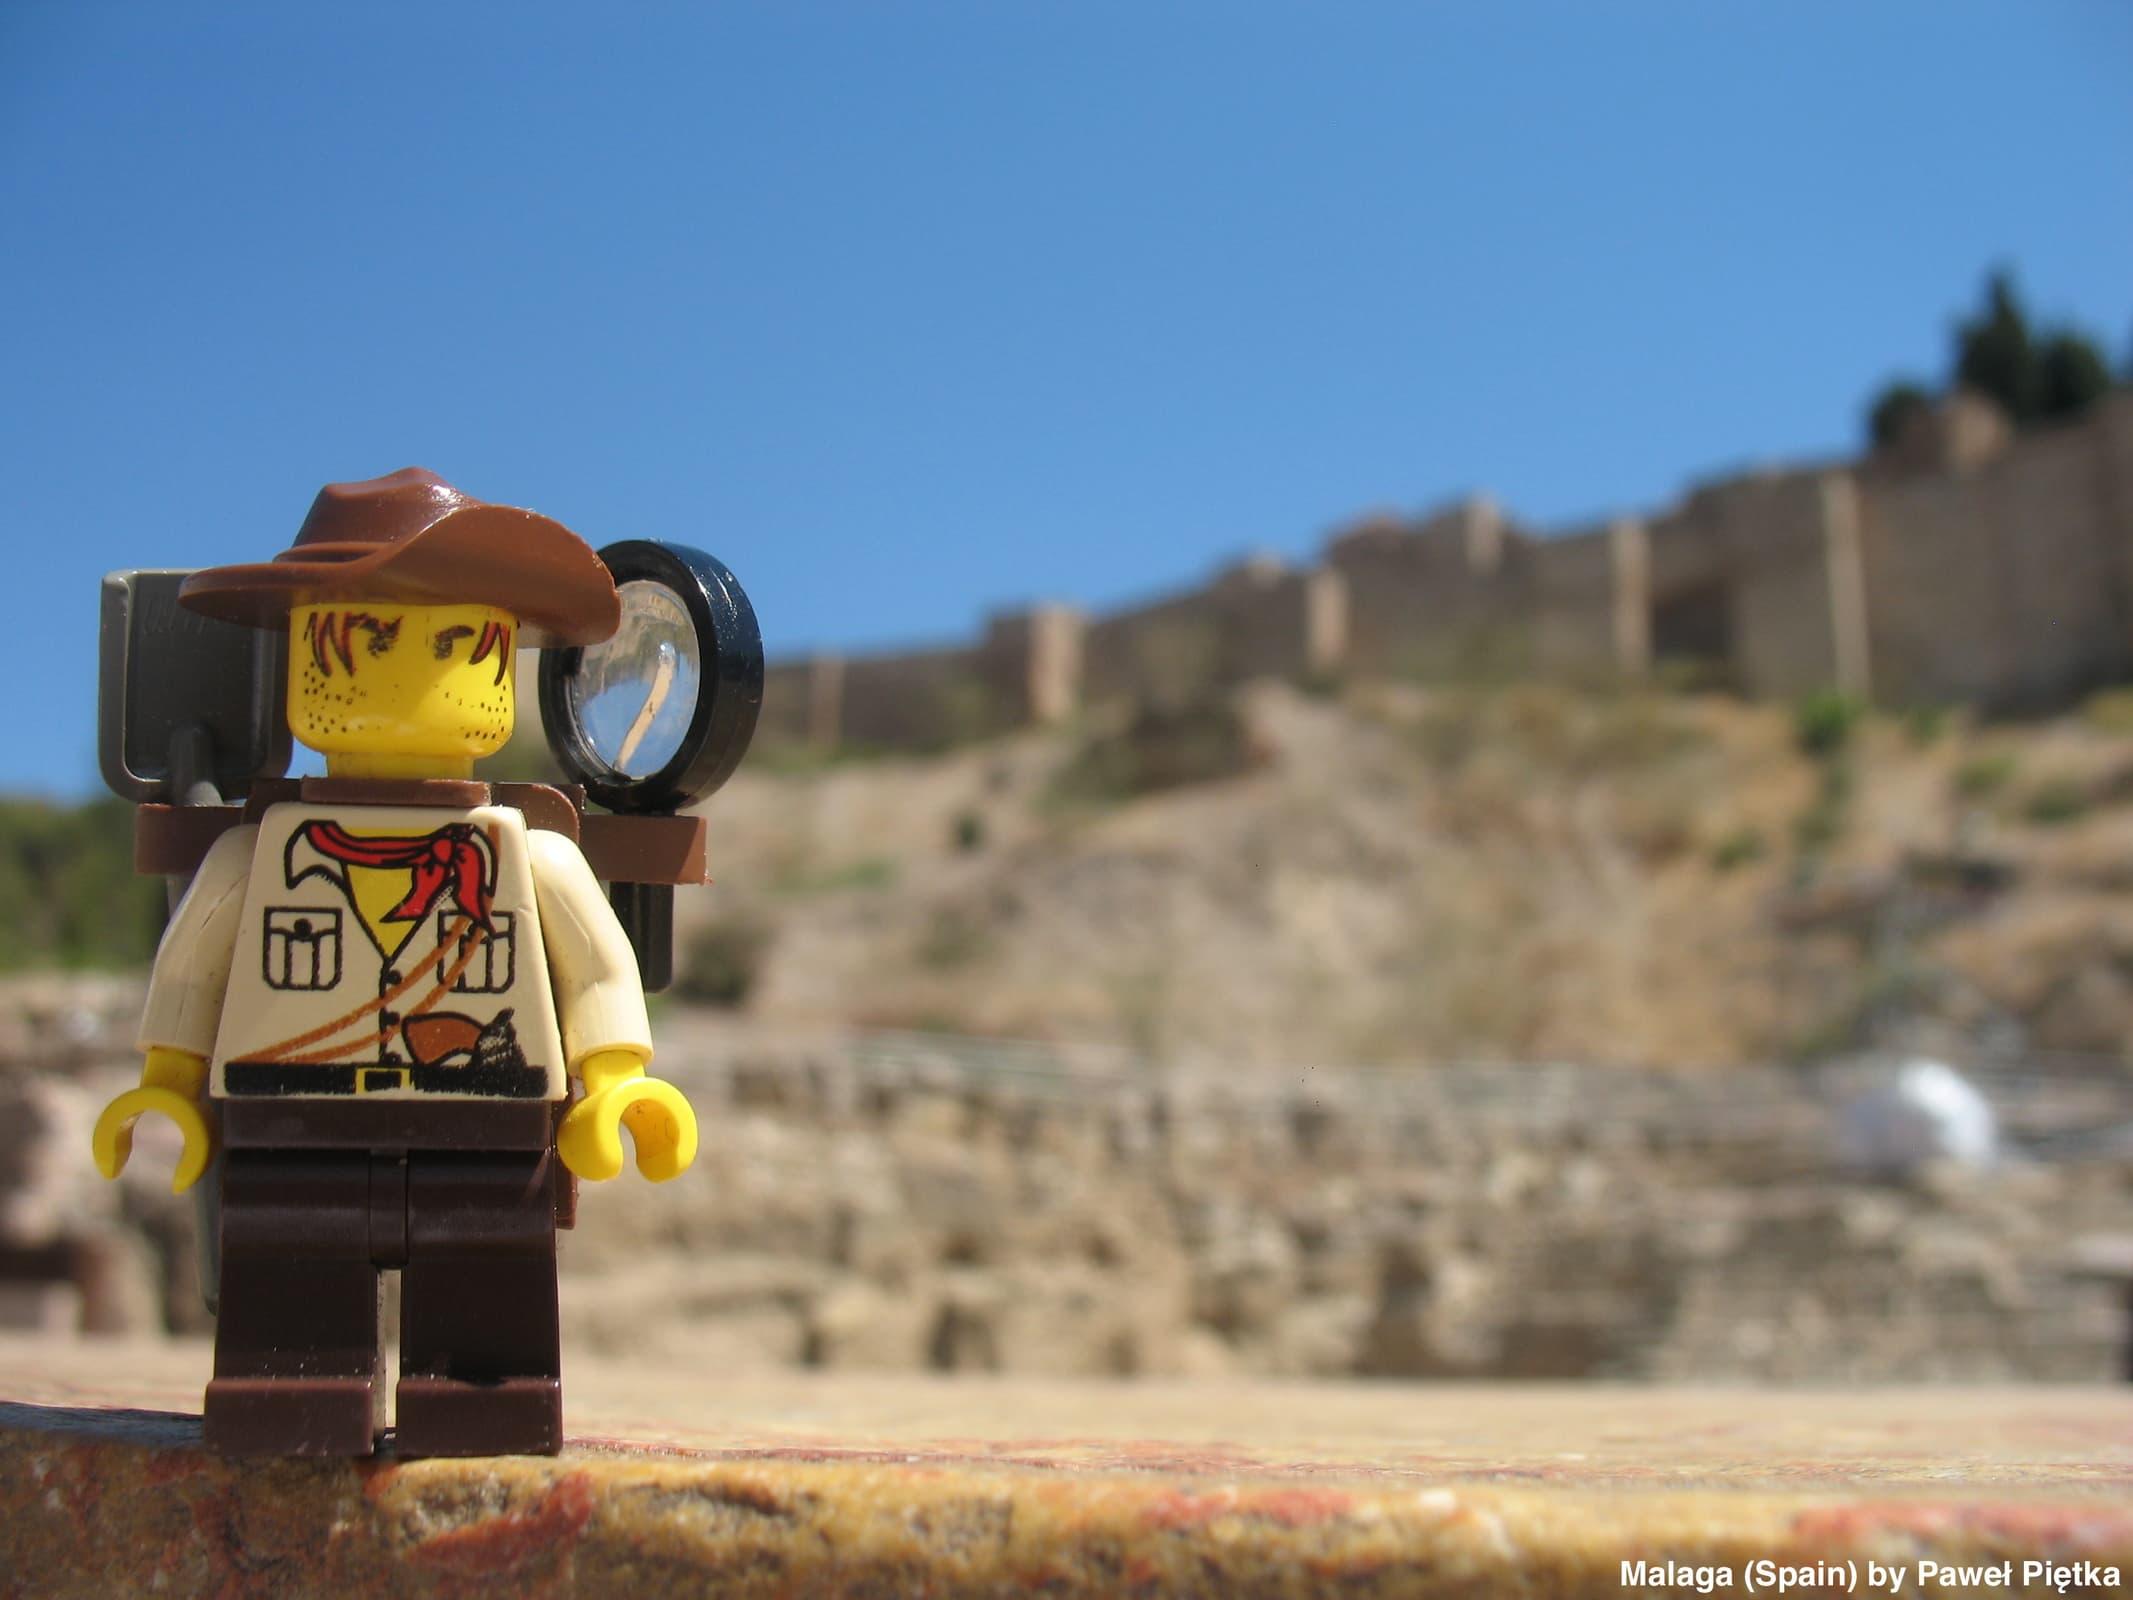 Malaga (Spain) - Roman theatre and Alcazaba